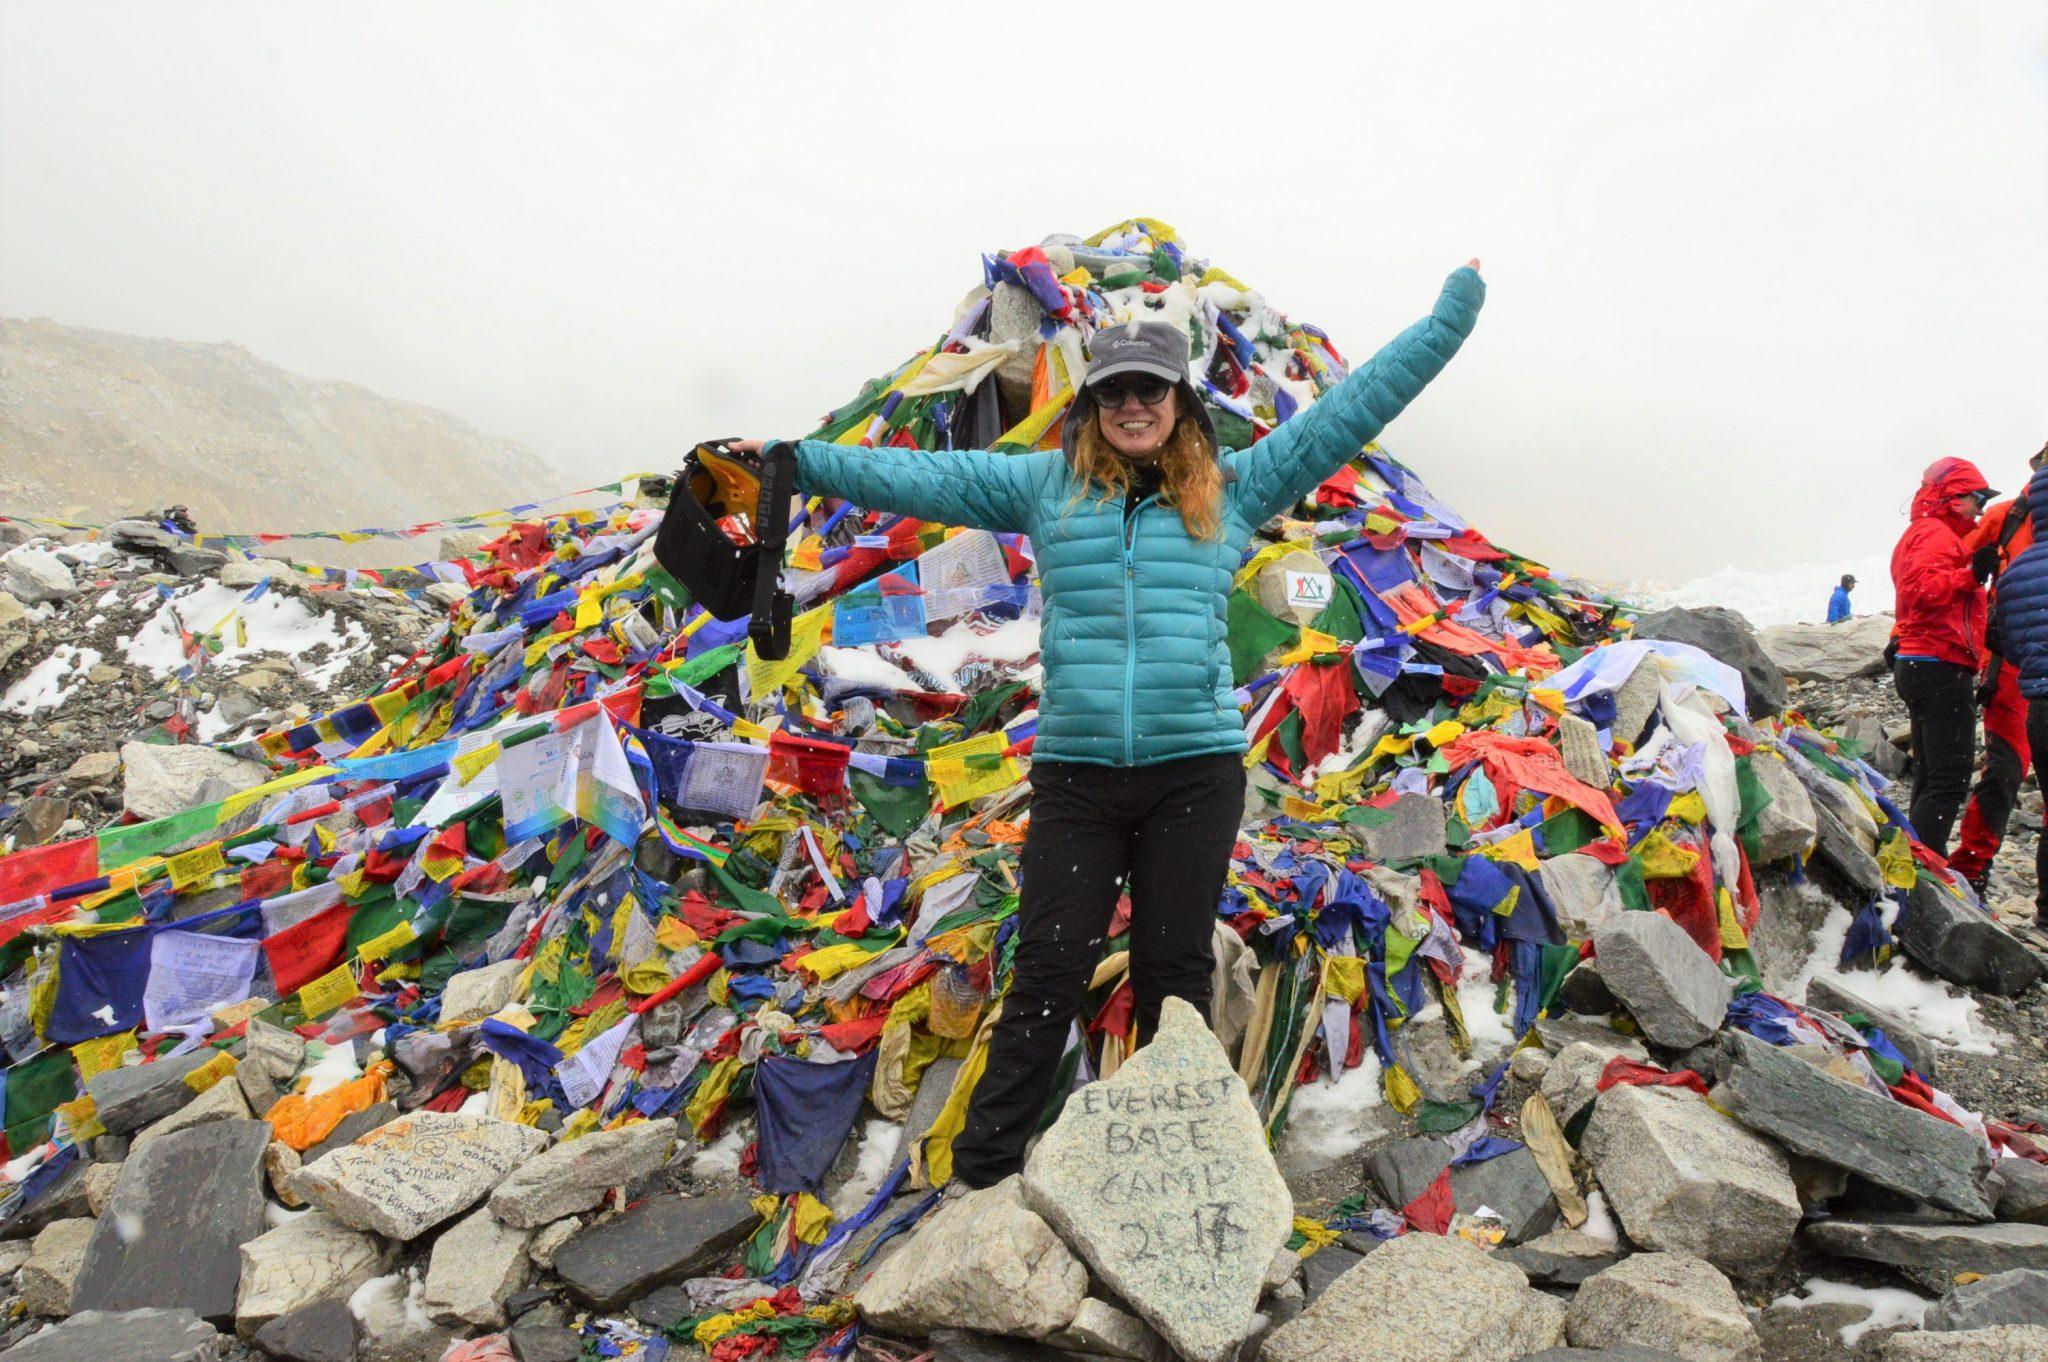 Everest Base Camp Trek: Days 7-10